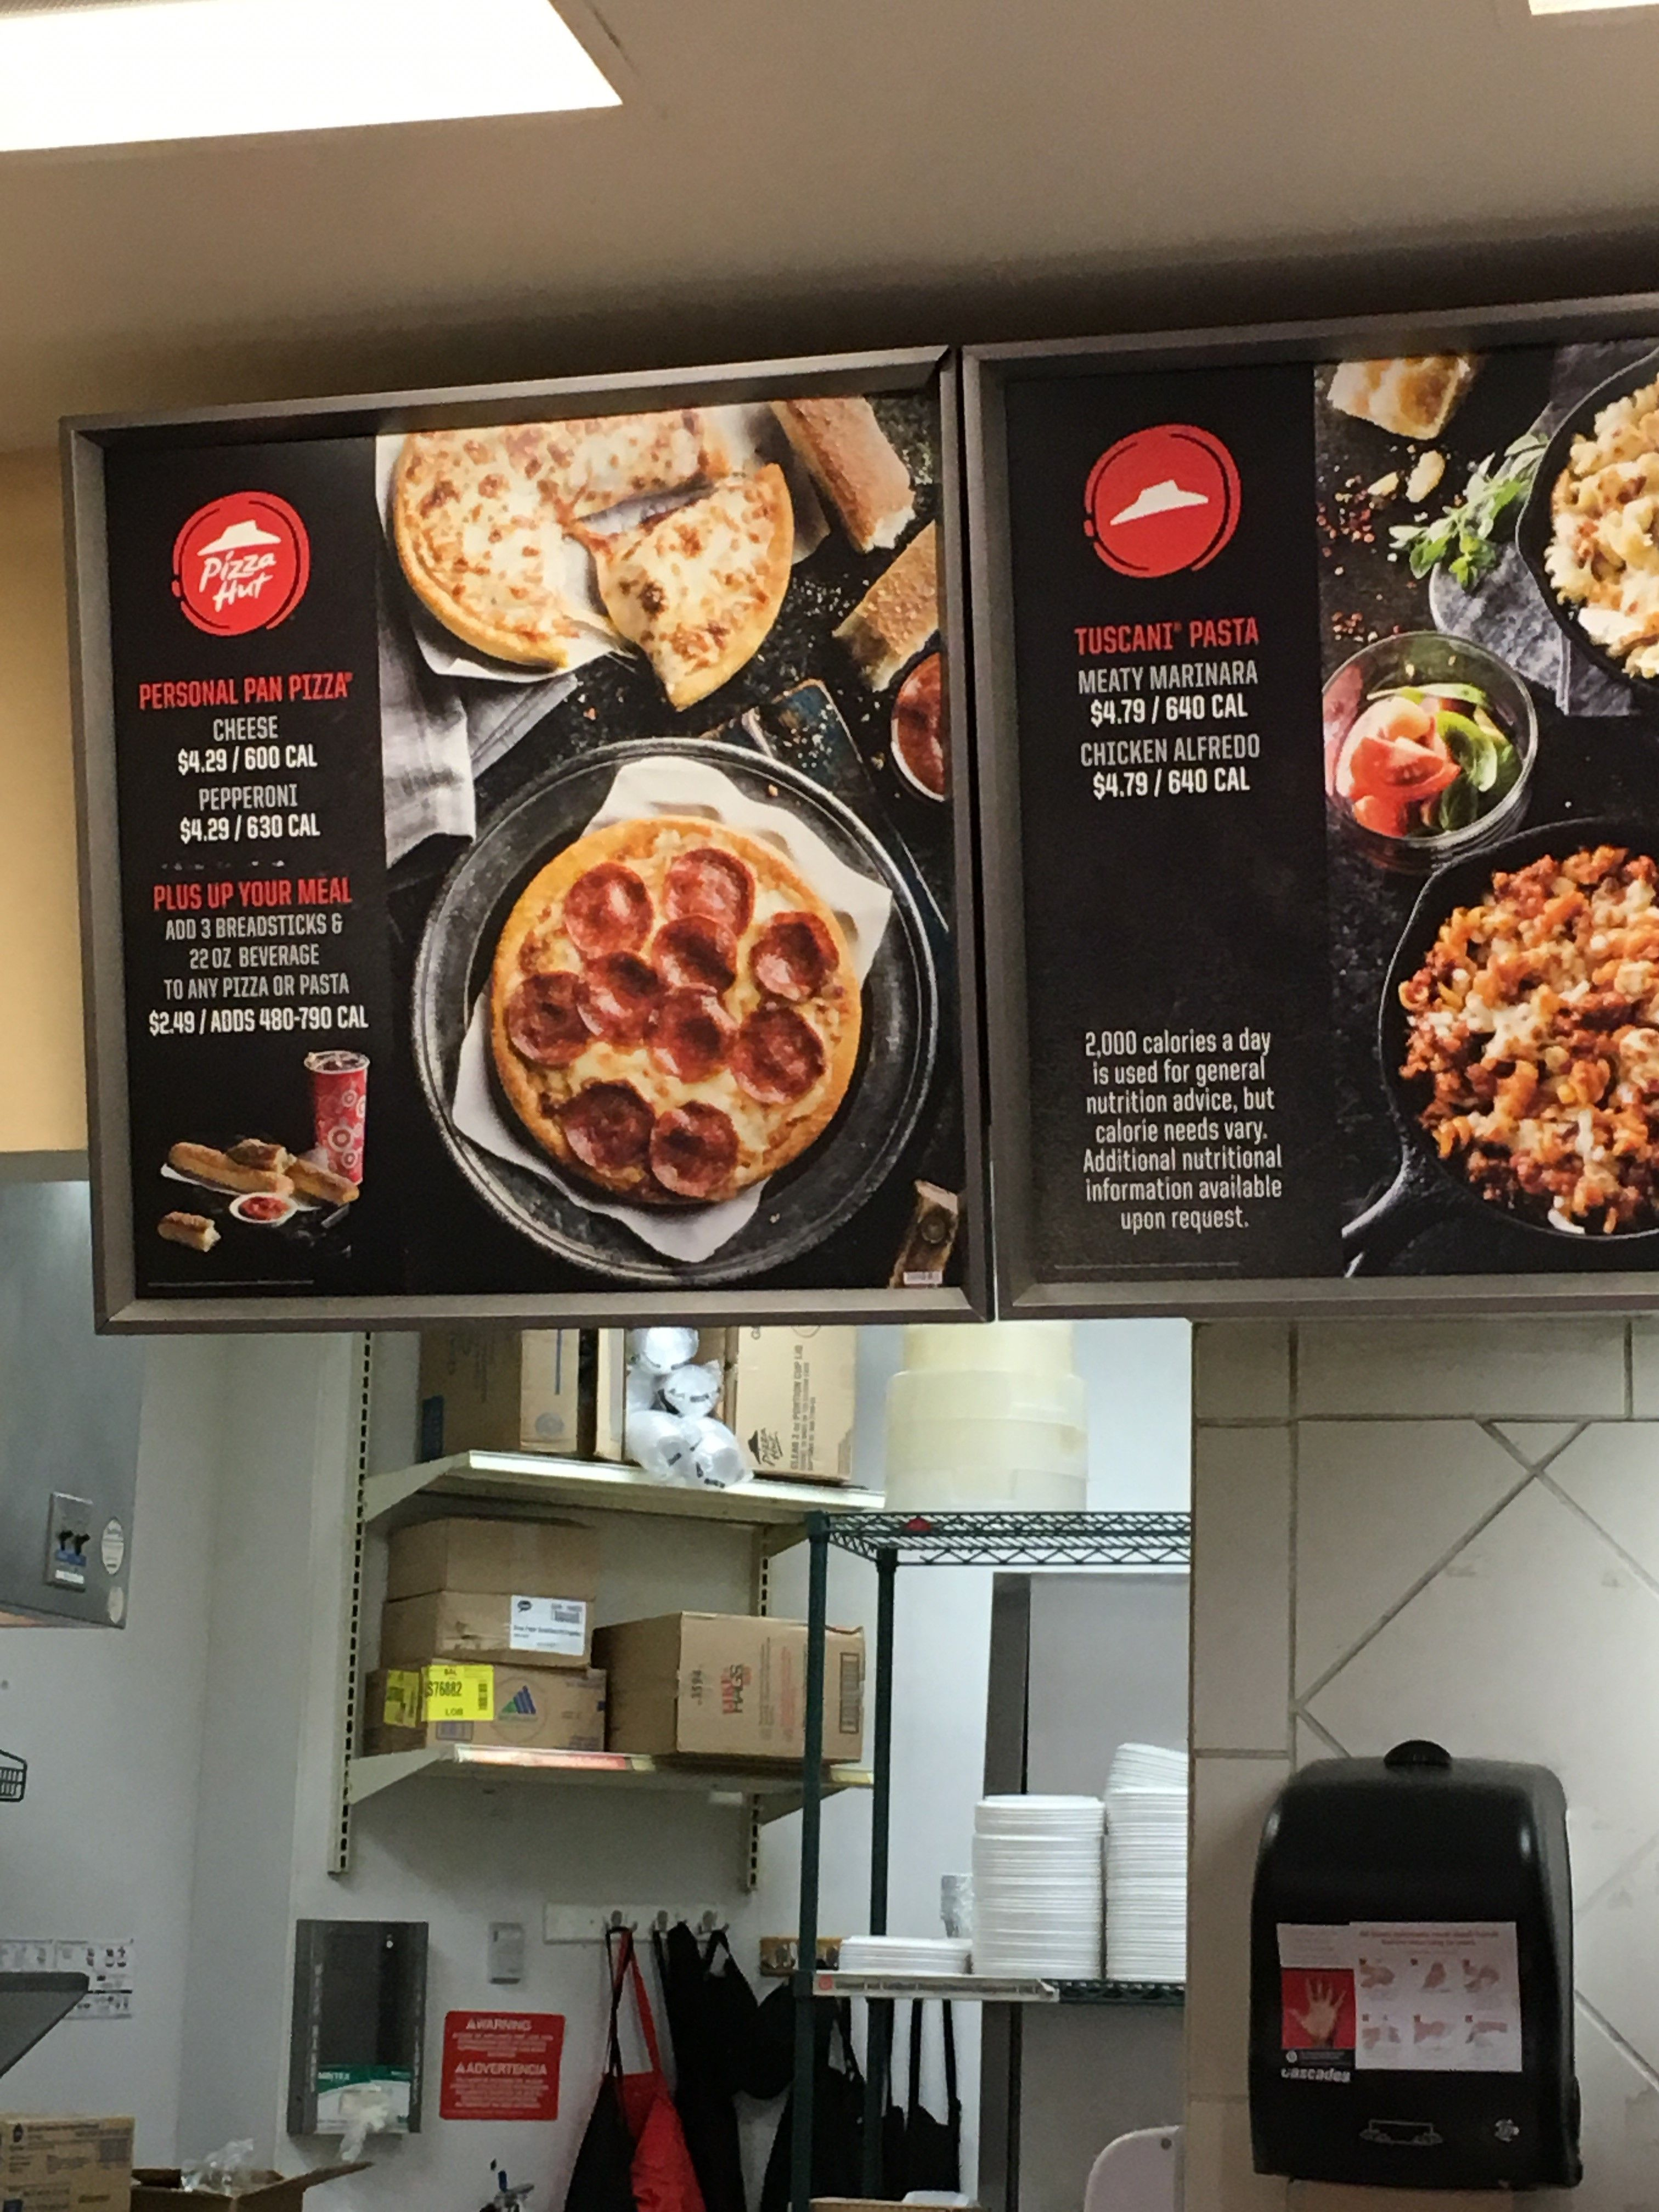 Target Pizza Hut Washington Dc May 2017 Pan Pizza Breadsticks Nutrition Advice